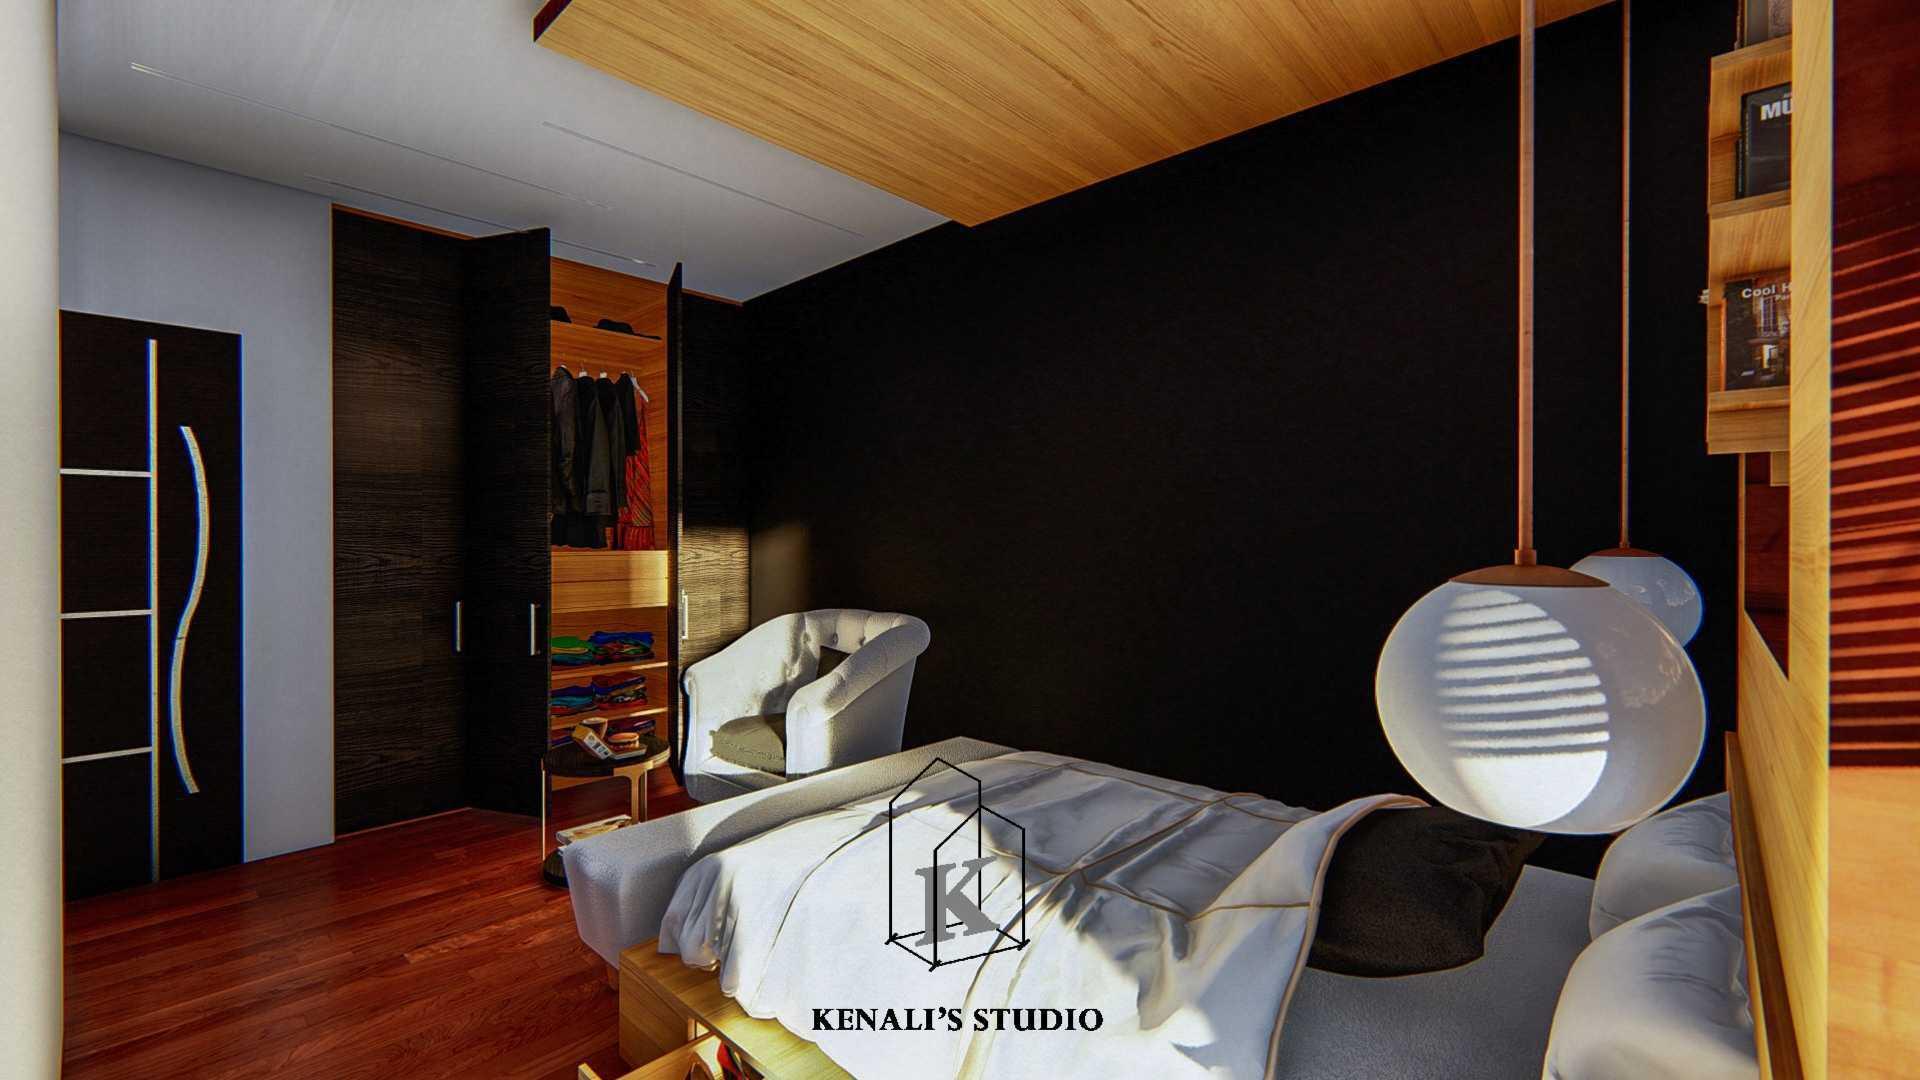 Kenali's Studio Project : Lowlit Bedroom Italia Italia Kenalis-Studio-Project-Lowlit-Bedroom  72930